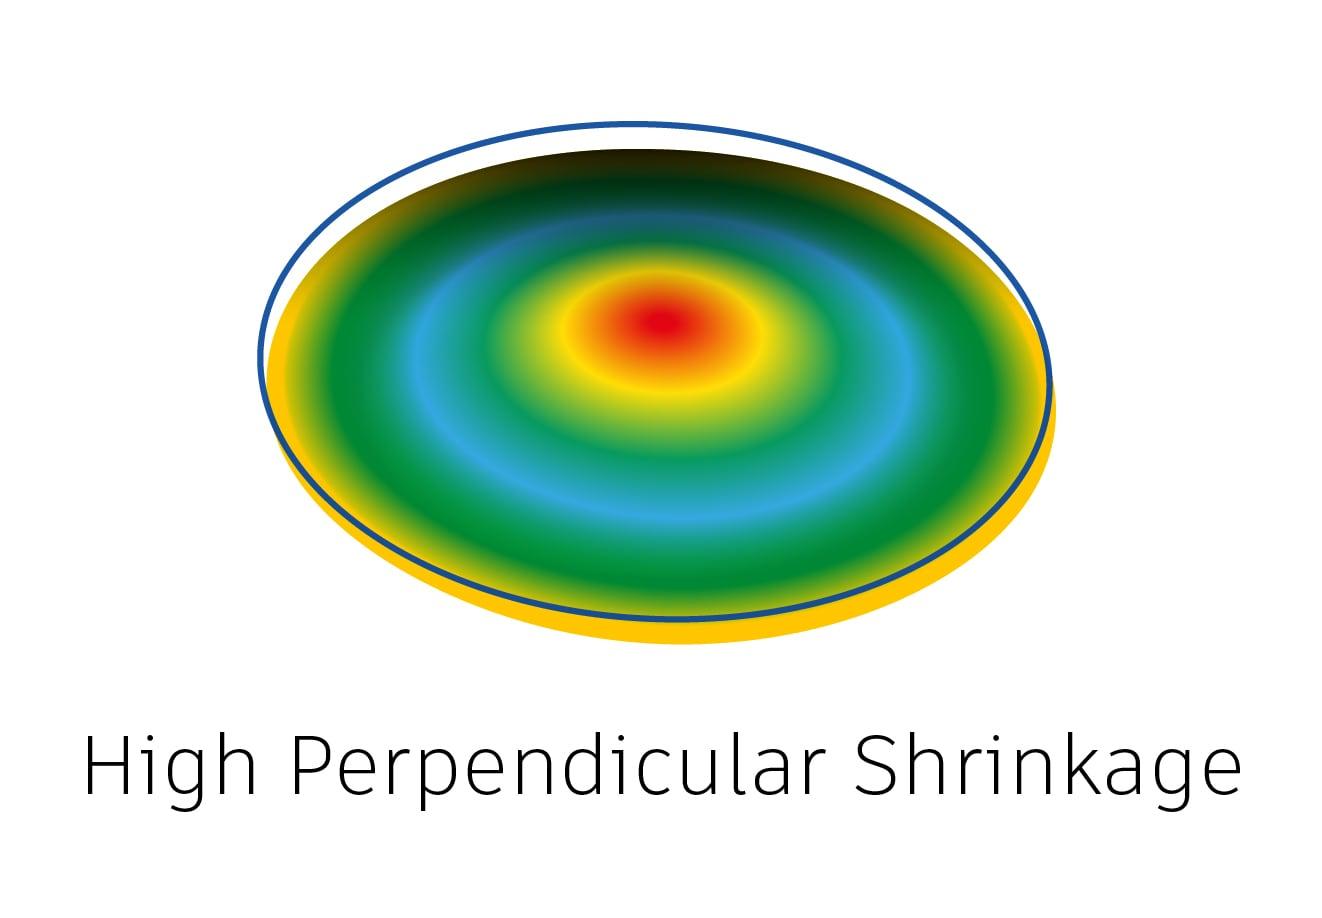 High perpendicular shrinkage